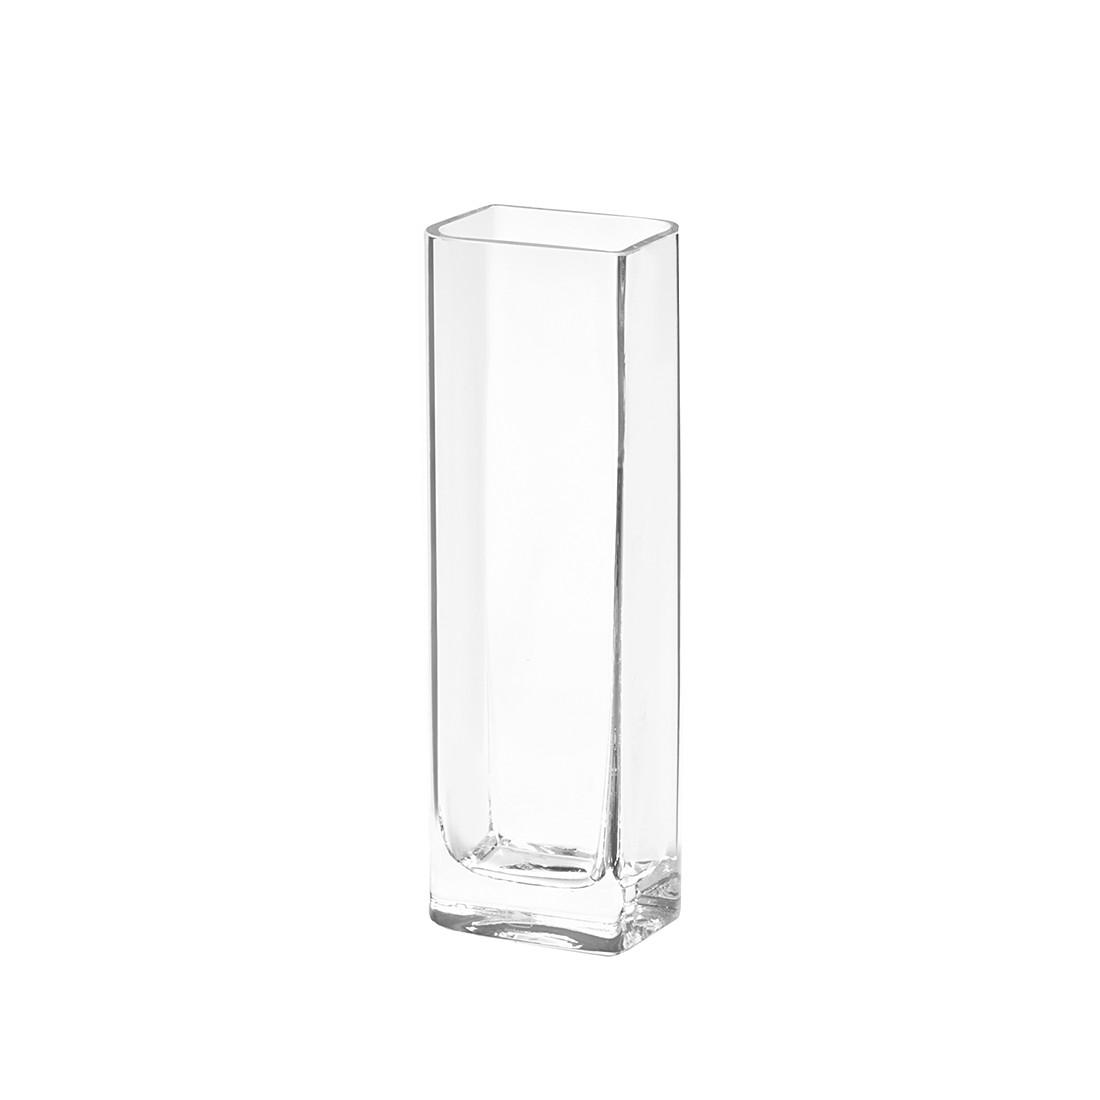 Vase Lucca – 20 x 7,5 cm, Leonardo online kaufen